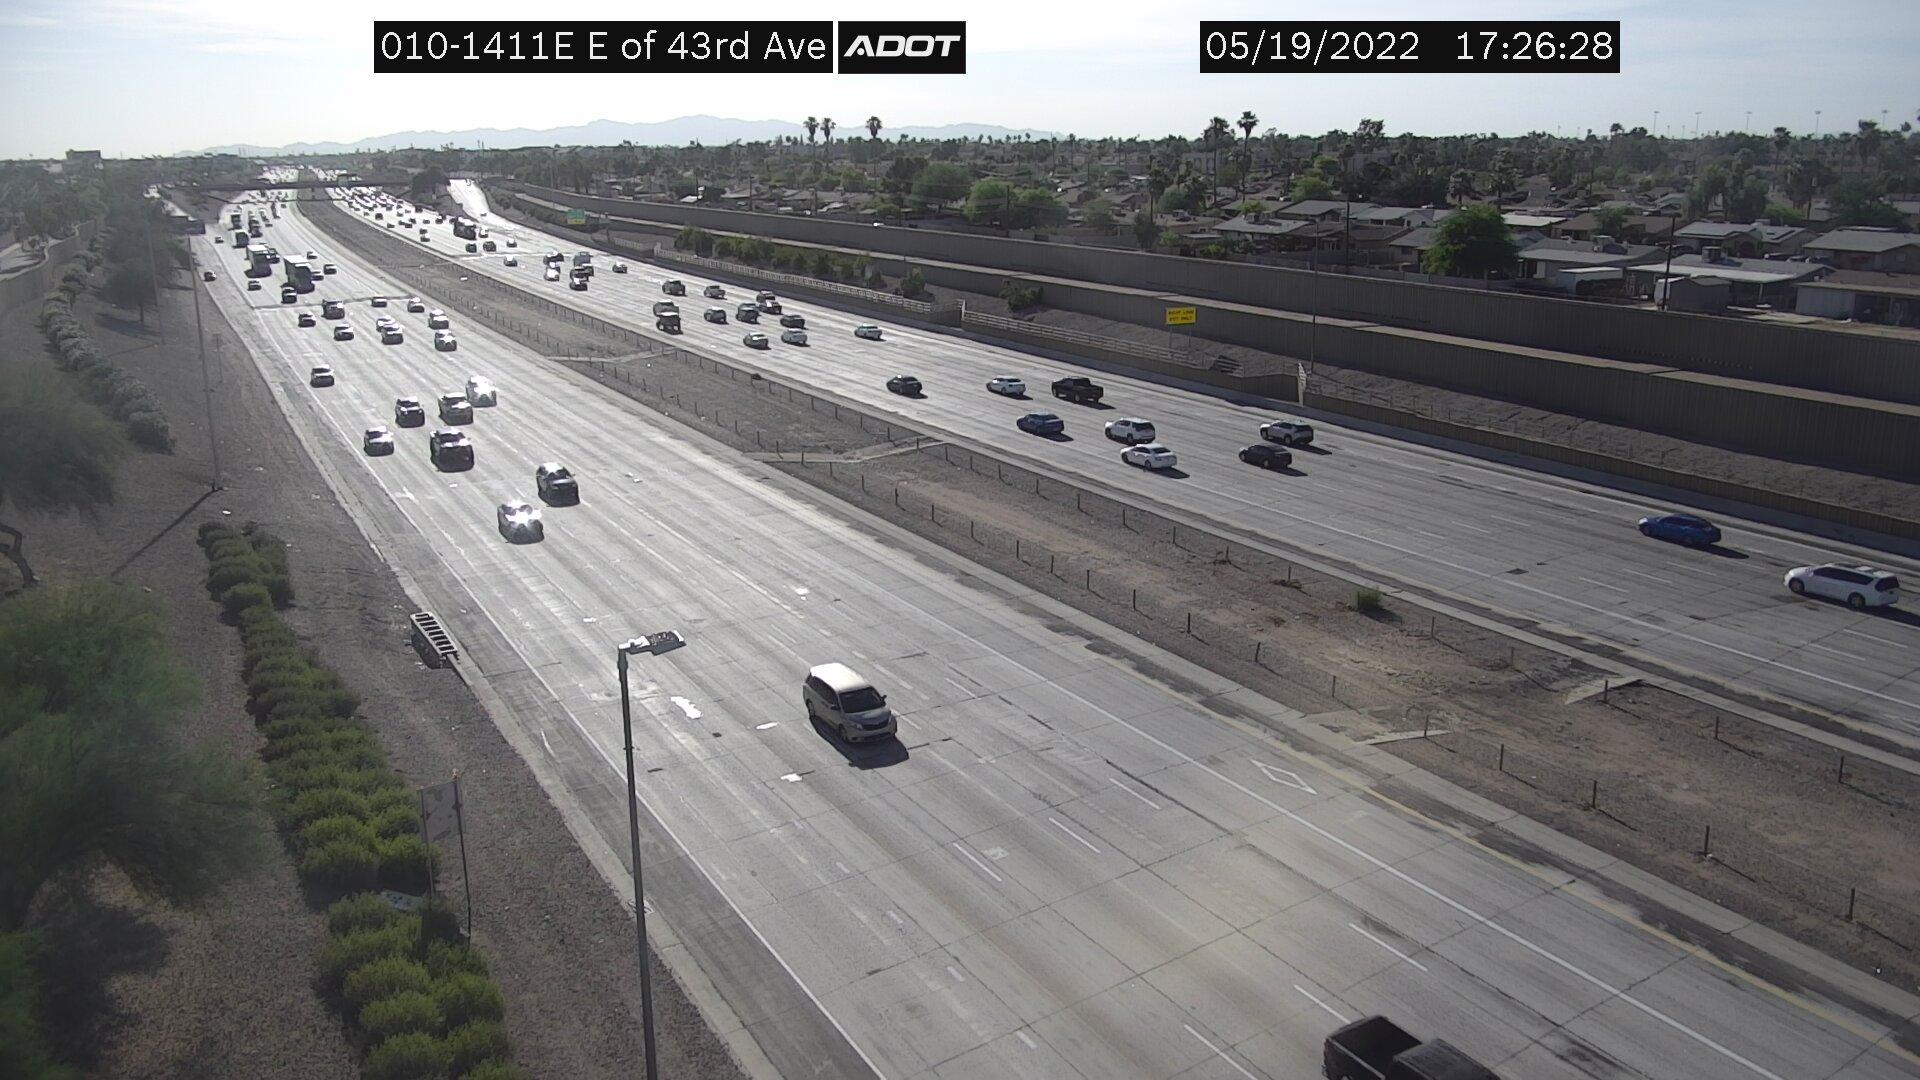 E of 43rd Ave EB (I10) (007) - Phoenix and Arizona